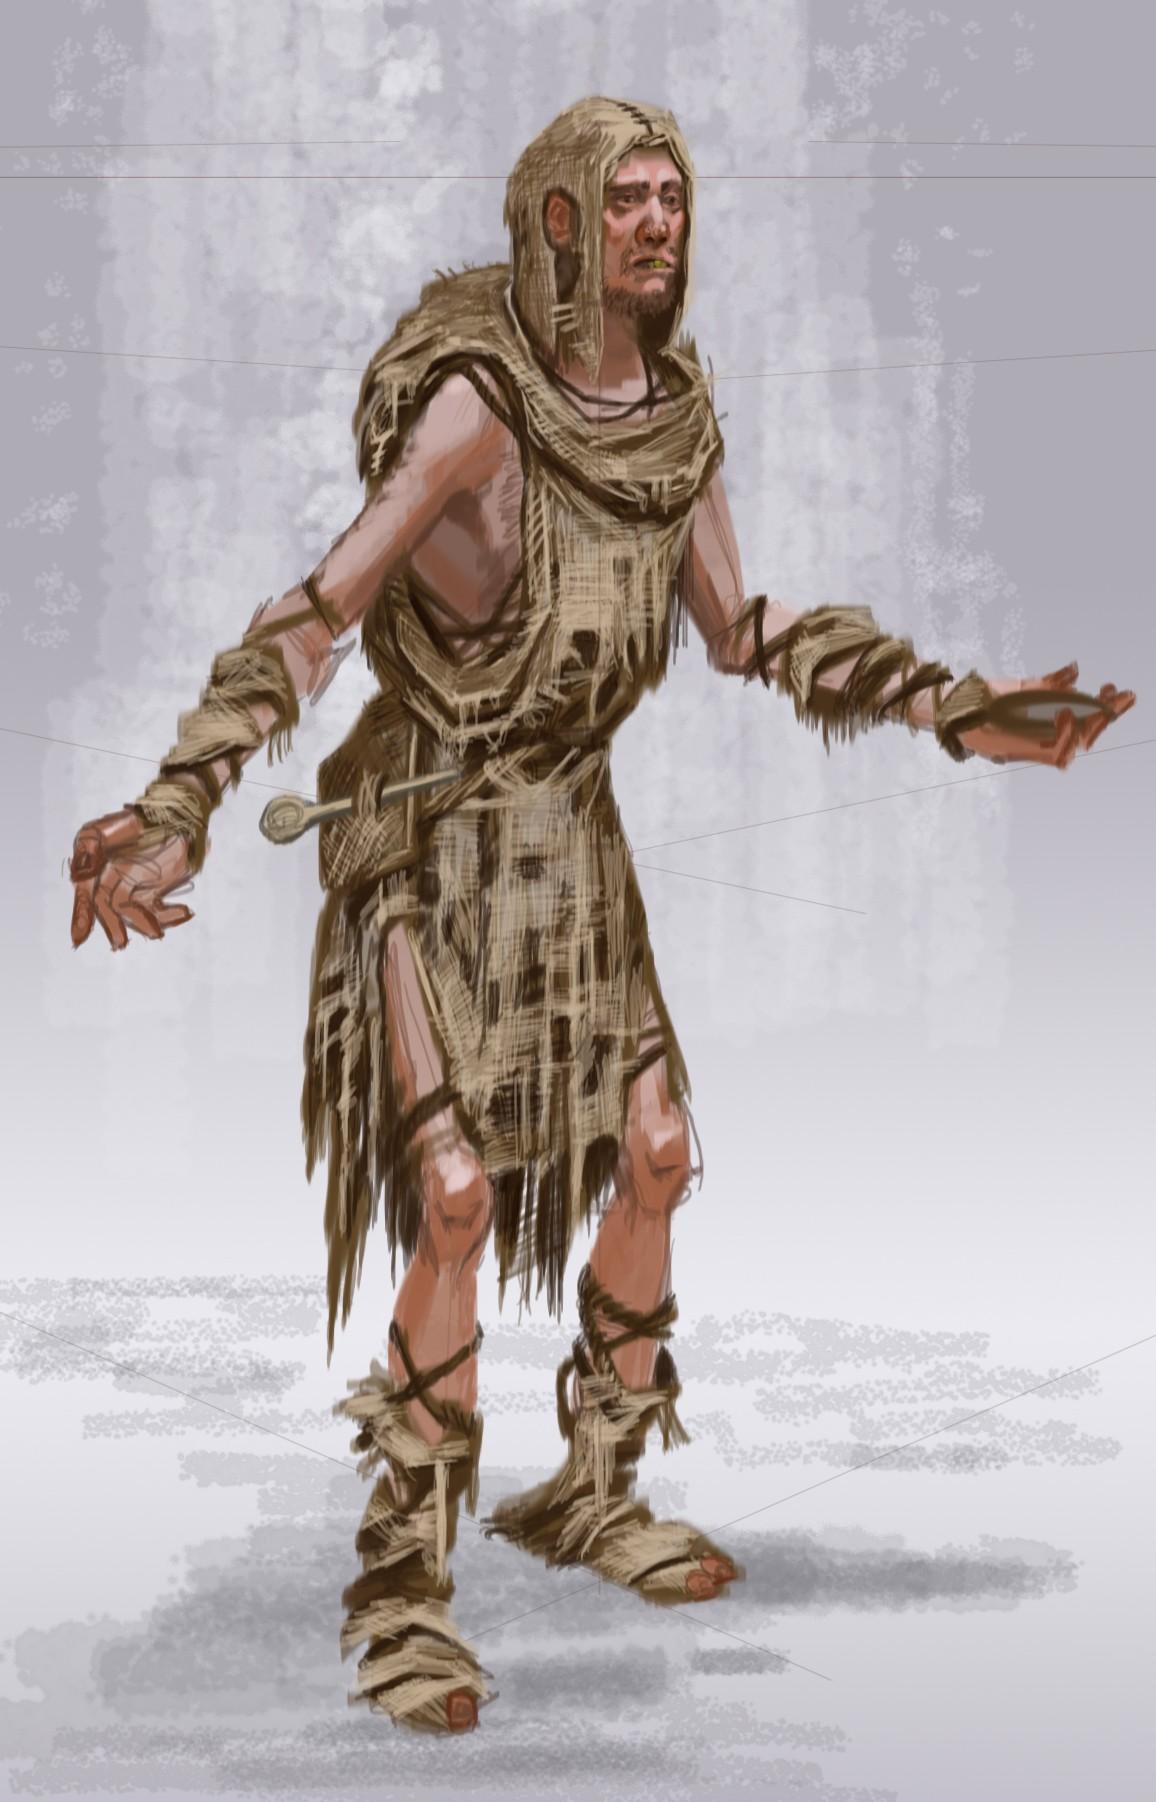 Beggars (Skyrim) | Elder Scrolls | FANDOM powered by Wikia